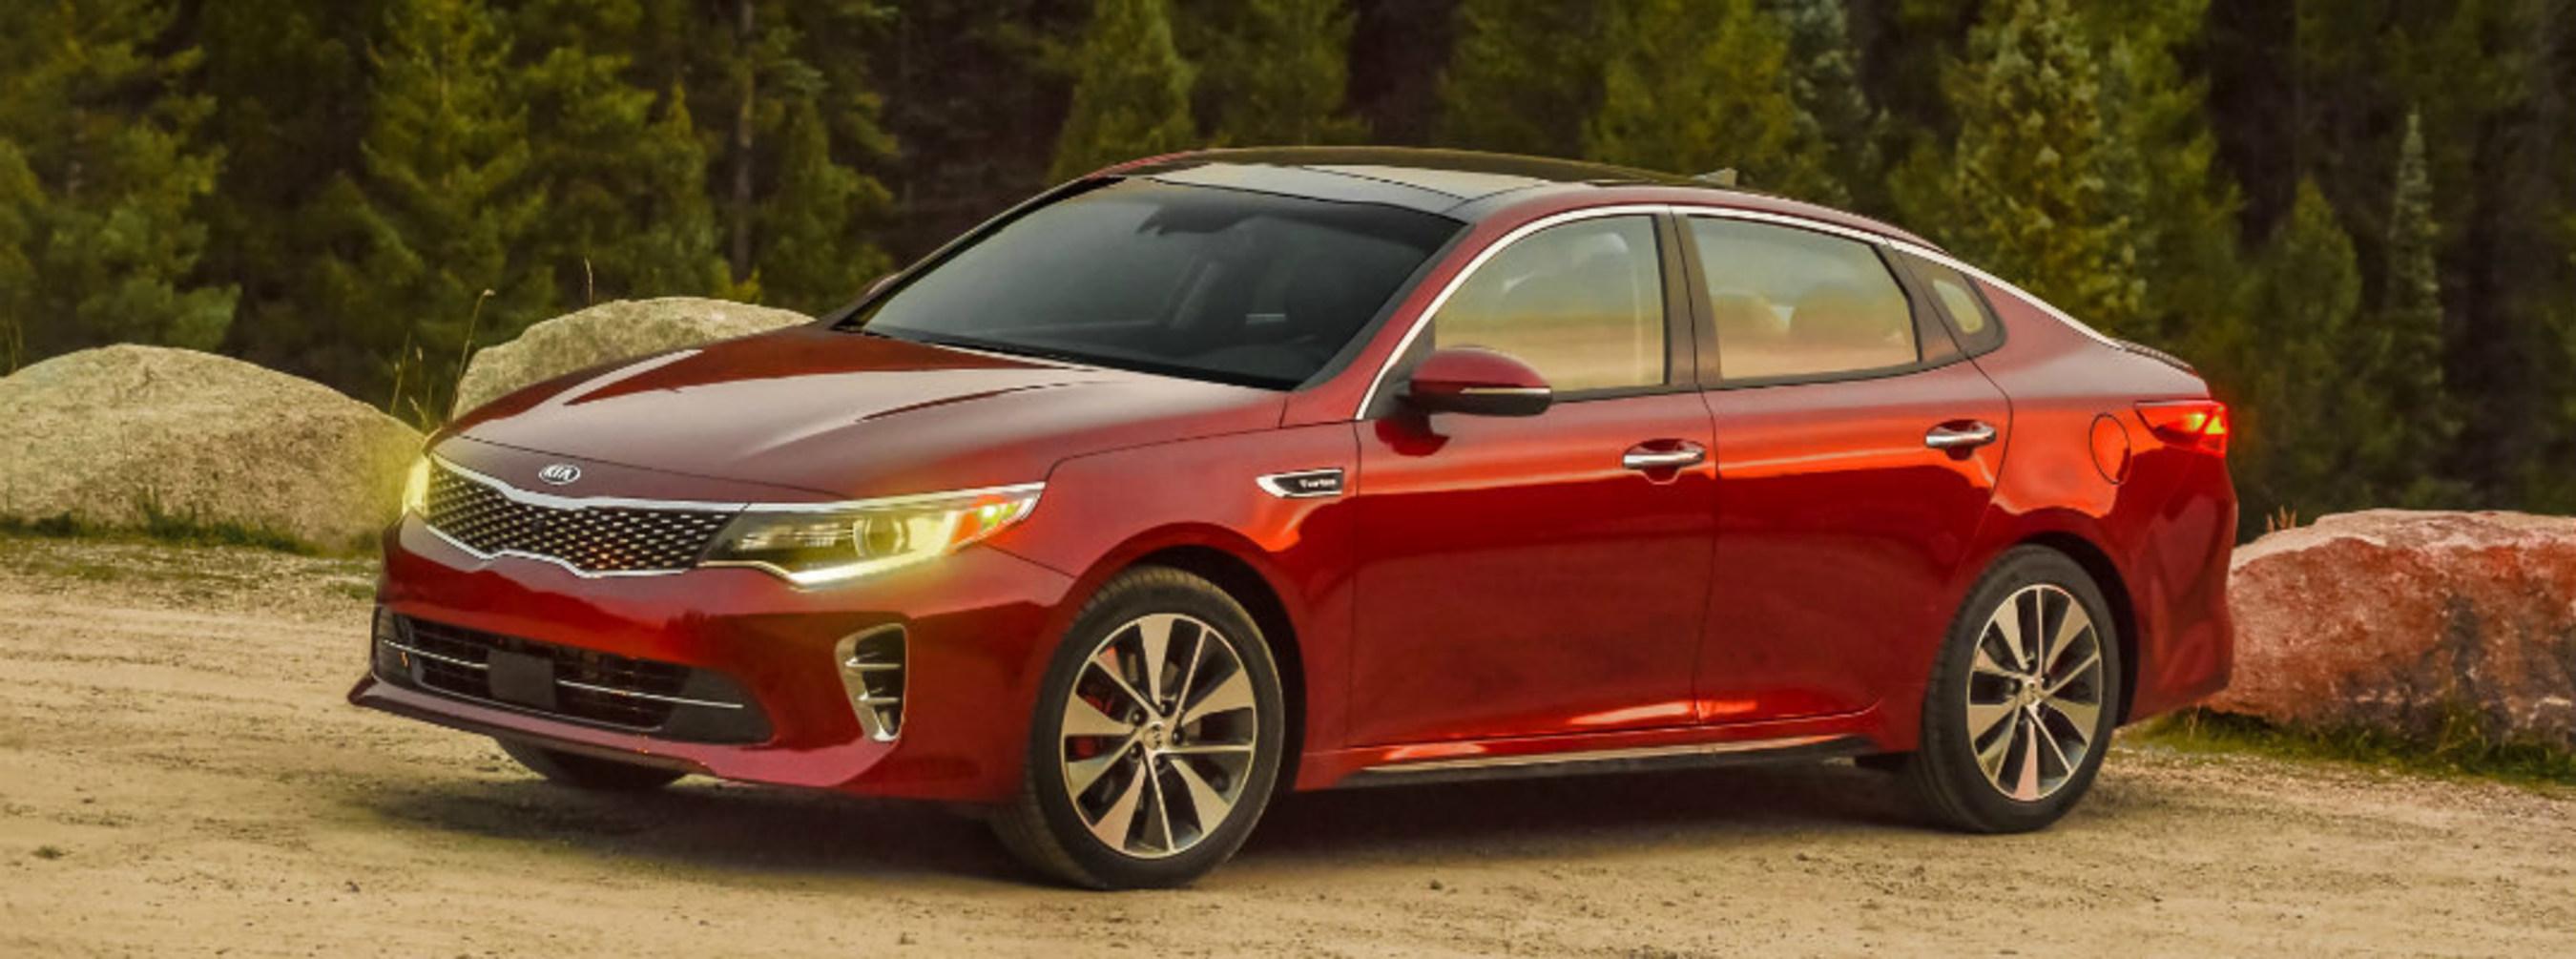 Serra Kia compares redesigned 2016 Optima to its fellow sedans